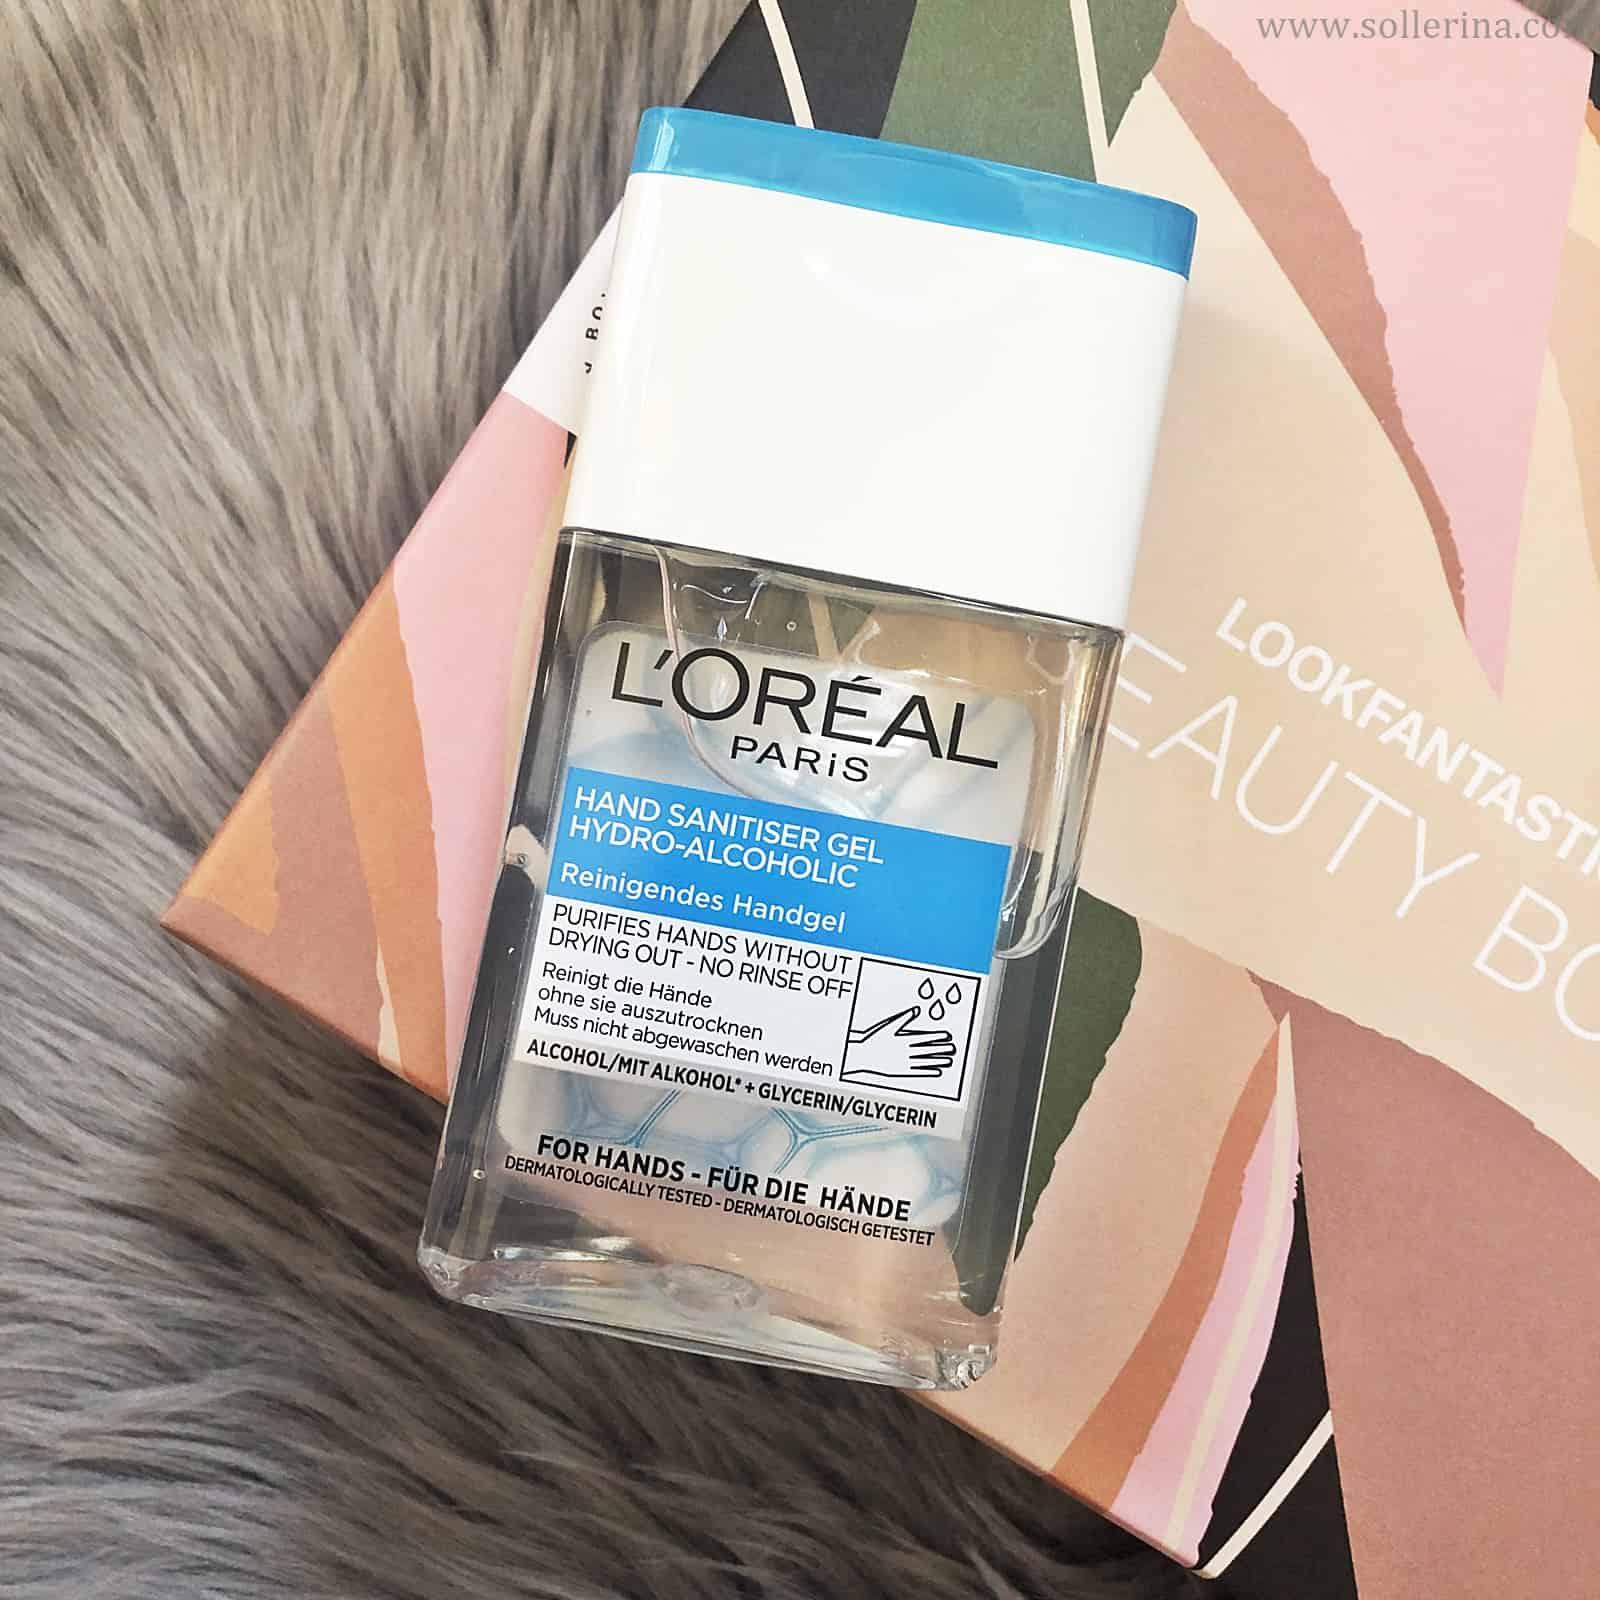 L'Oreal Paris – Hand Sanitiser Gel Hydro-Alcoholic